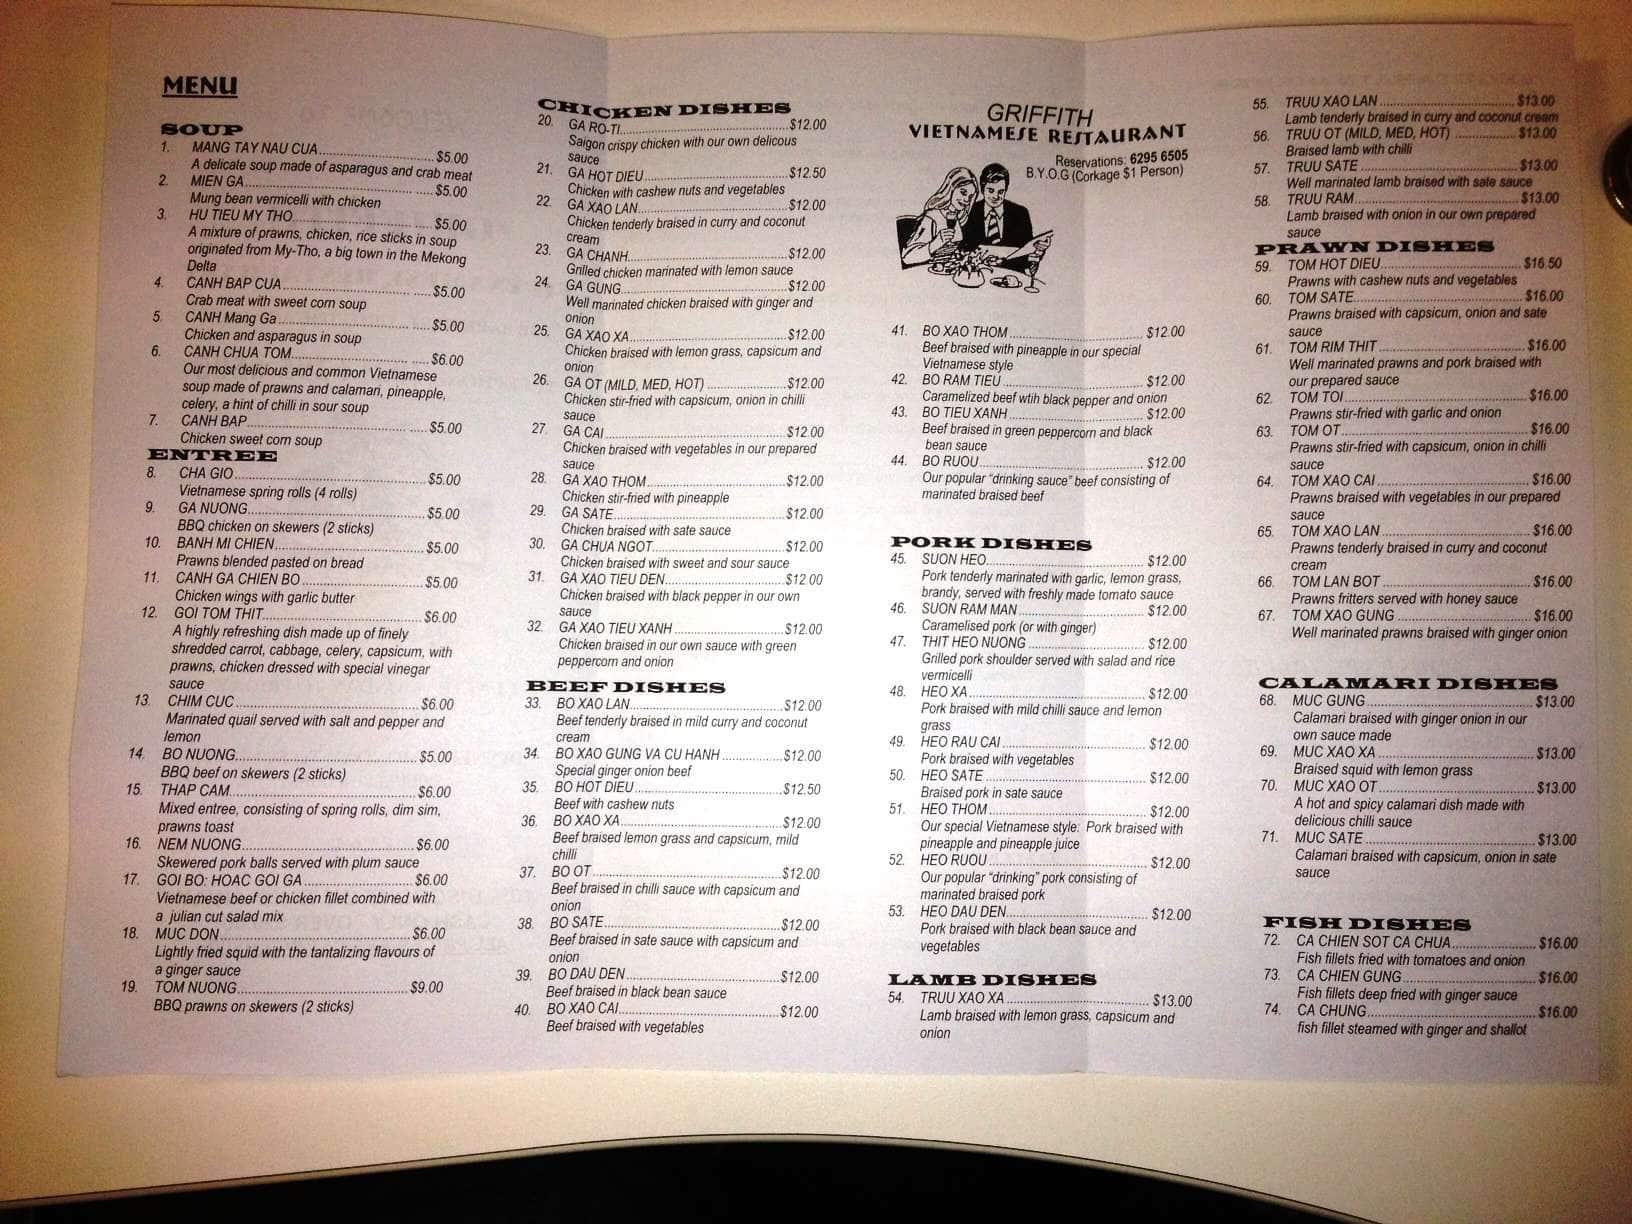 Griffith Vietnamese Restaurant Menu